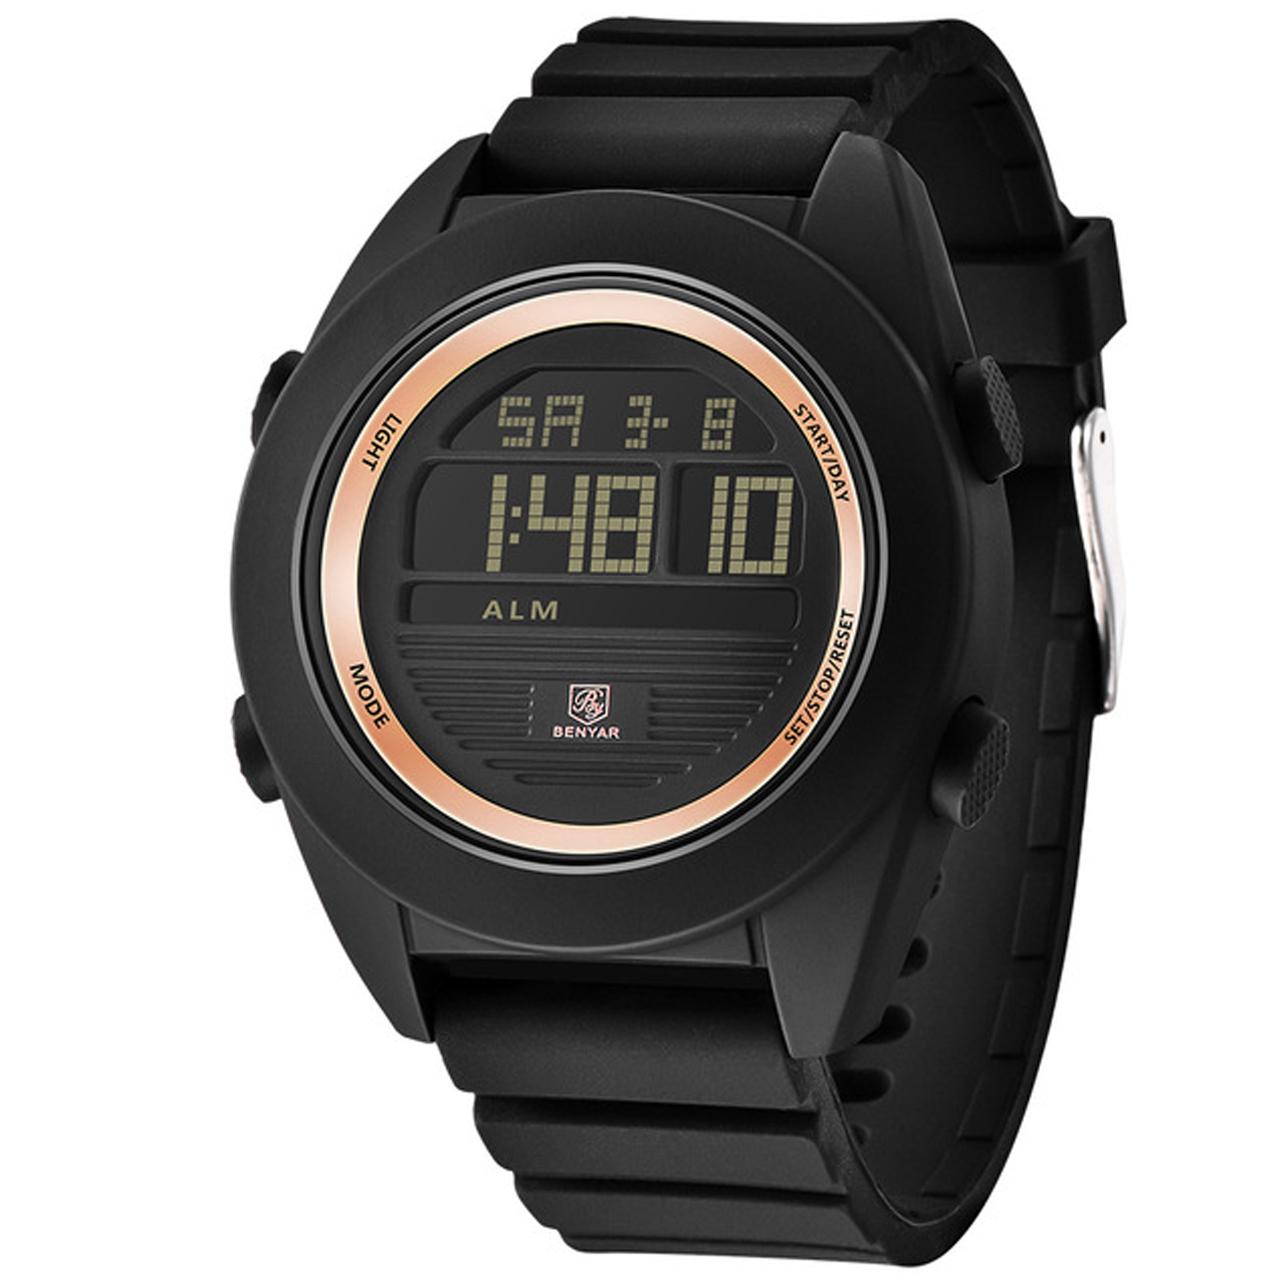 ساعت مچی دیجیتالی مردانه بنیار مدل 8002RG 12